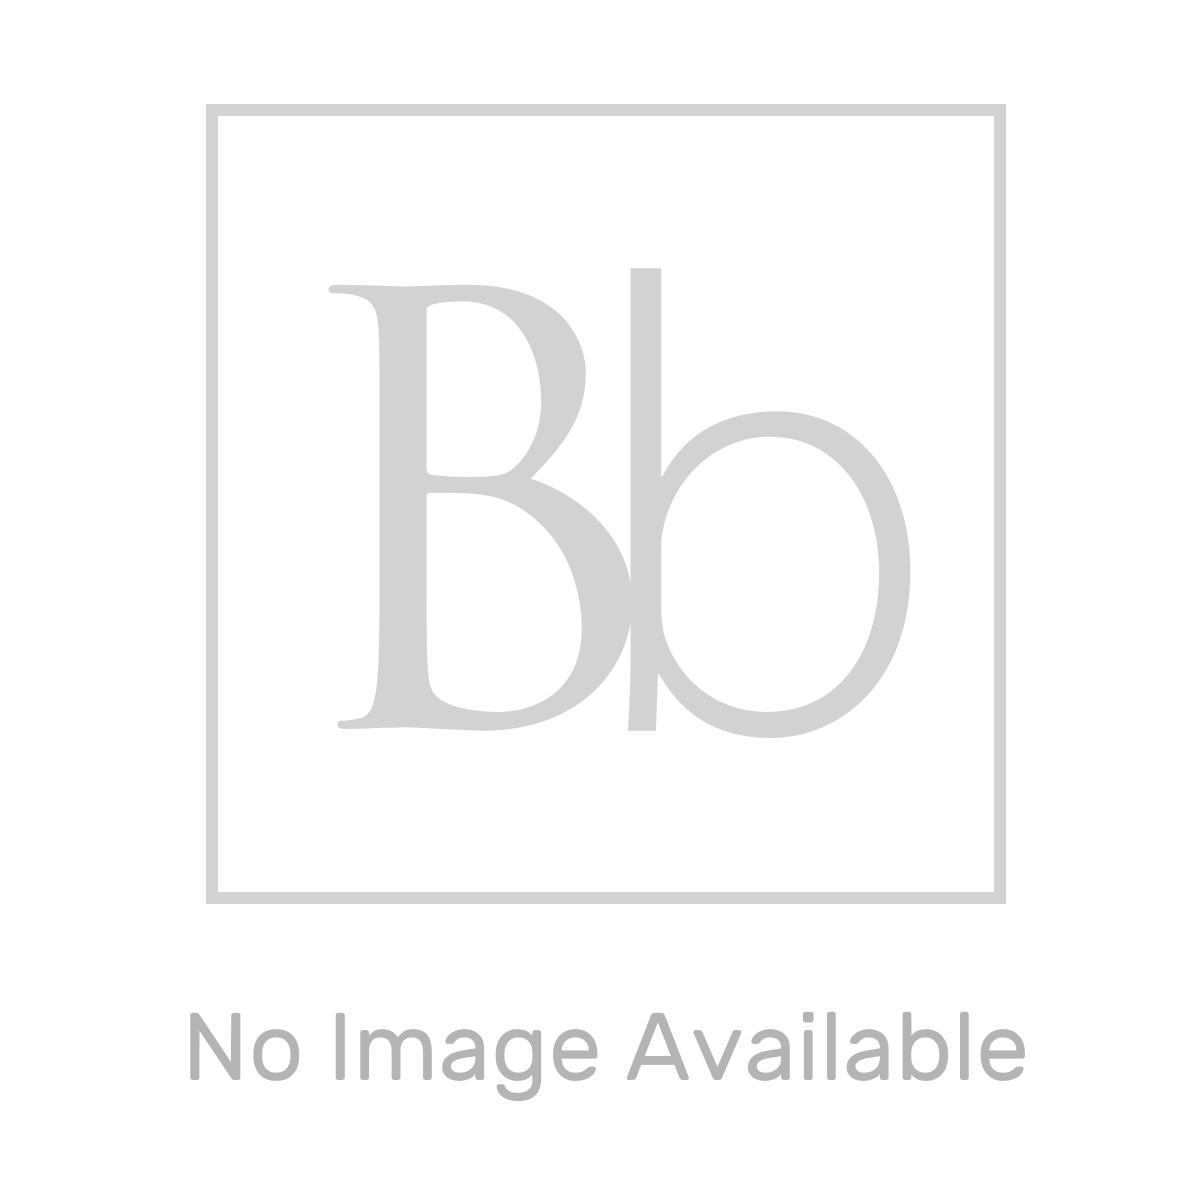 Hudson Reed Quartet White Gloss 3 Door Mirror Cabinet 1350mm